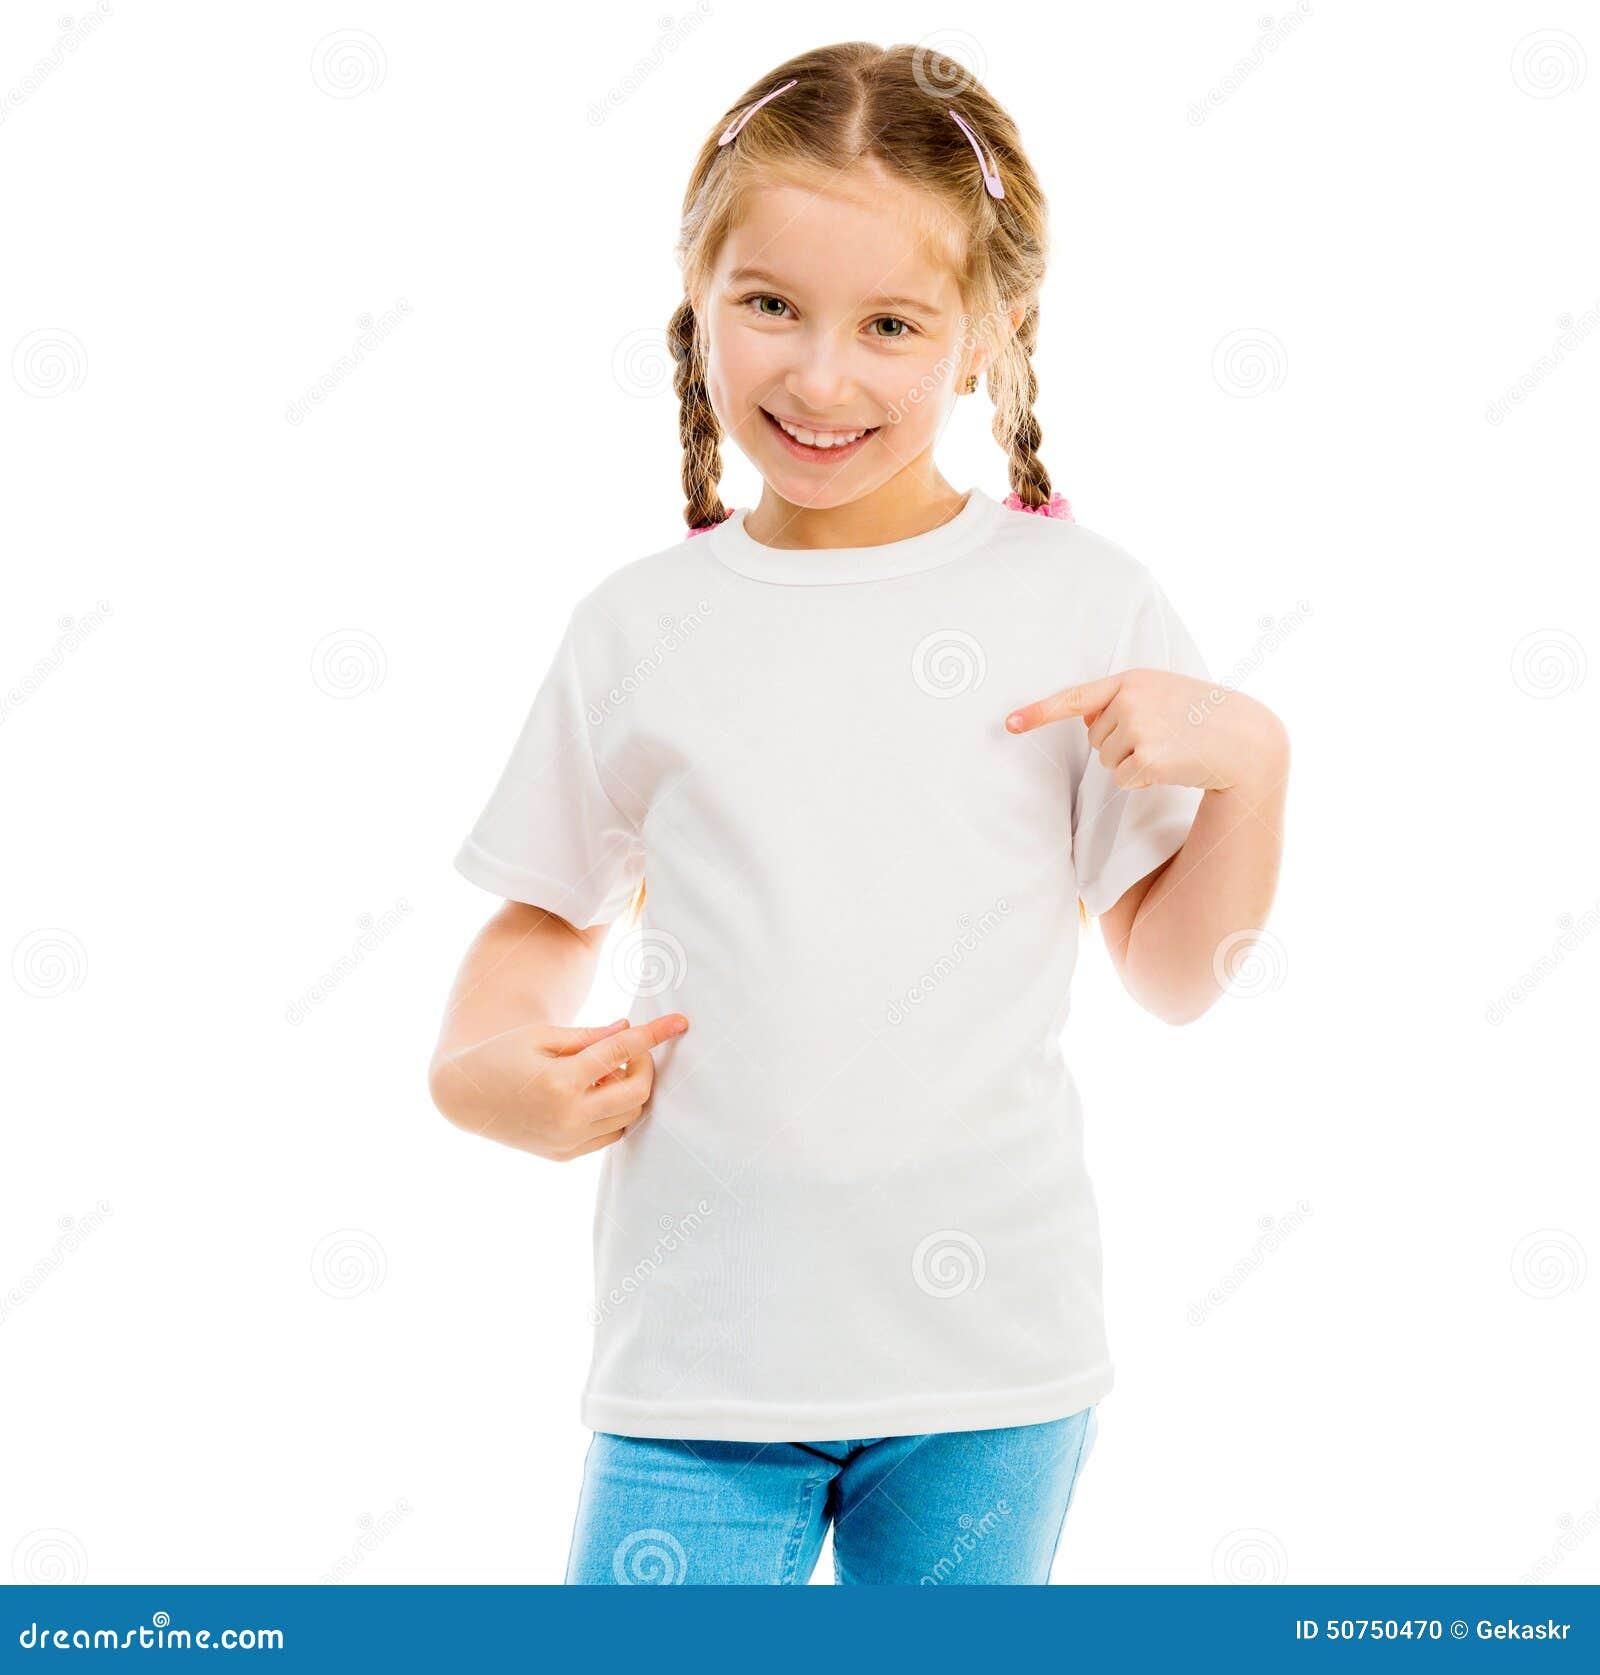 8b235596f4c3 Το χαριτωμένο μικρό κορίτσι σε μια άσπρη μπλούζα και το τζιν παντελόνι σε  ένα άσπρο υπόβαθρο παρουσιάζει μια μπλούζα επάνω